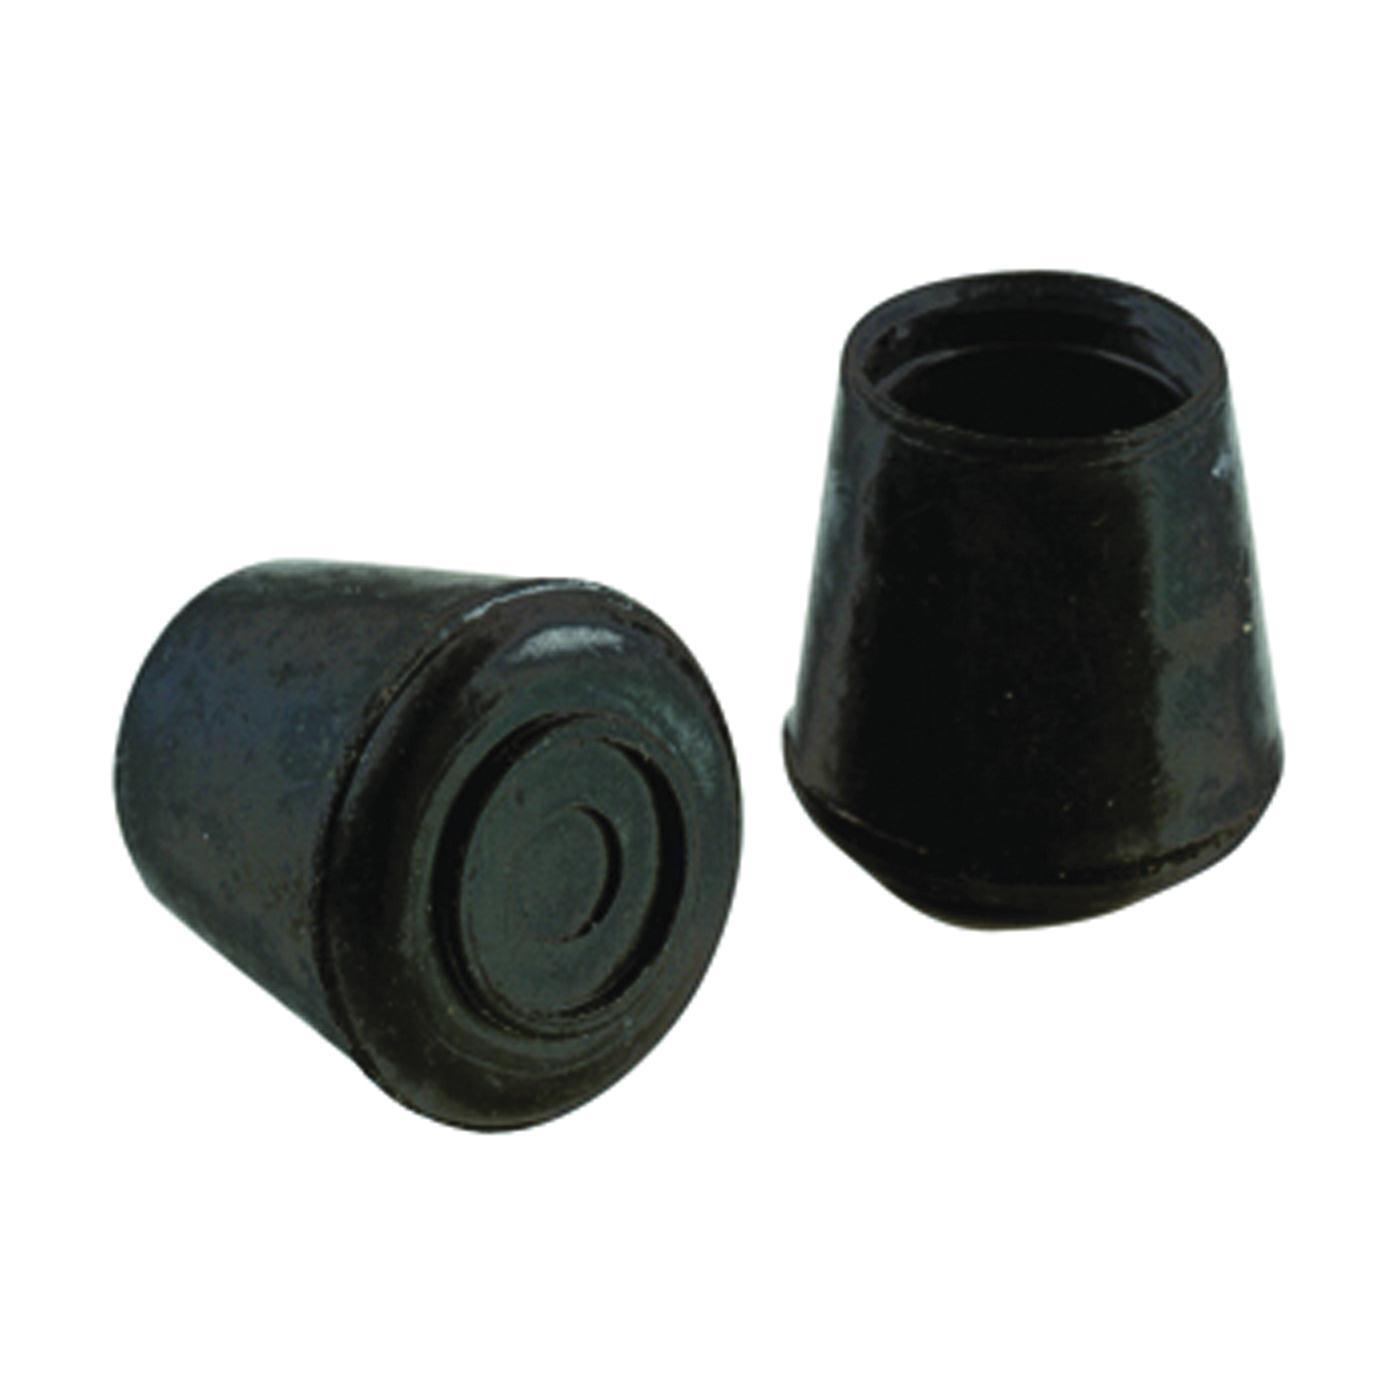 Picture of Shepherd Hardware 9125 Furniture Leg Tip, Round, Rubber, Black, 5/8 in Dia